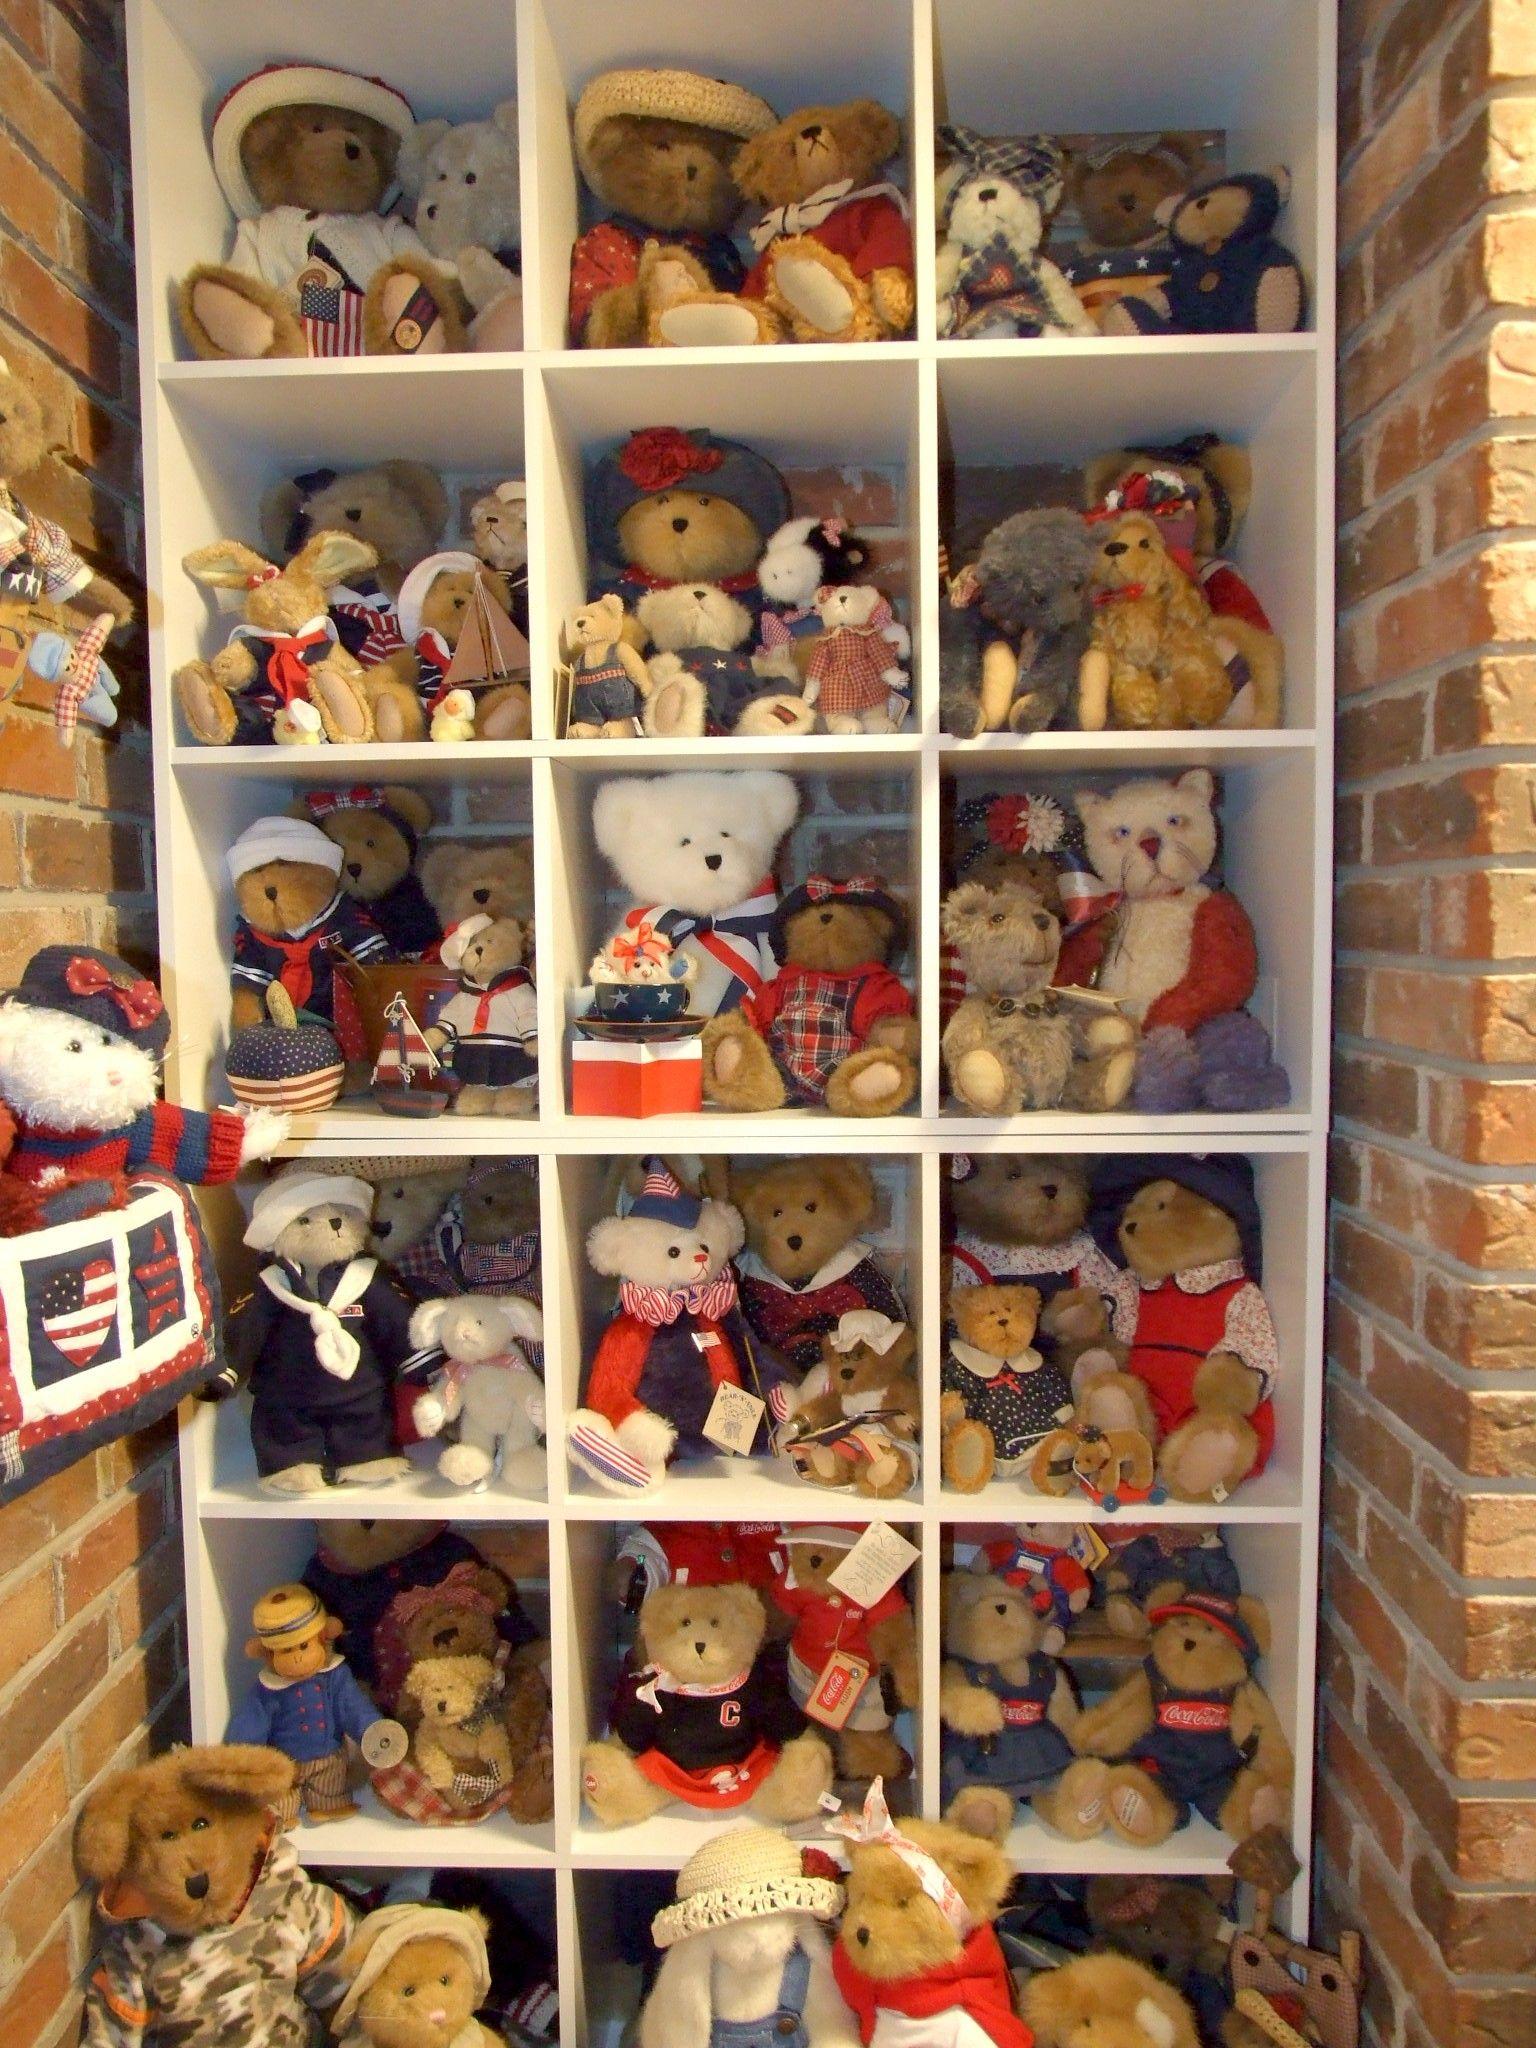 Family Room wall of bears | Stuffed animal displays, Teddy ... on